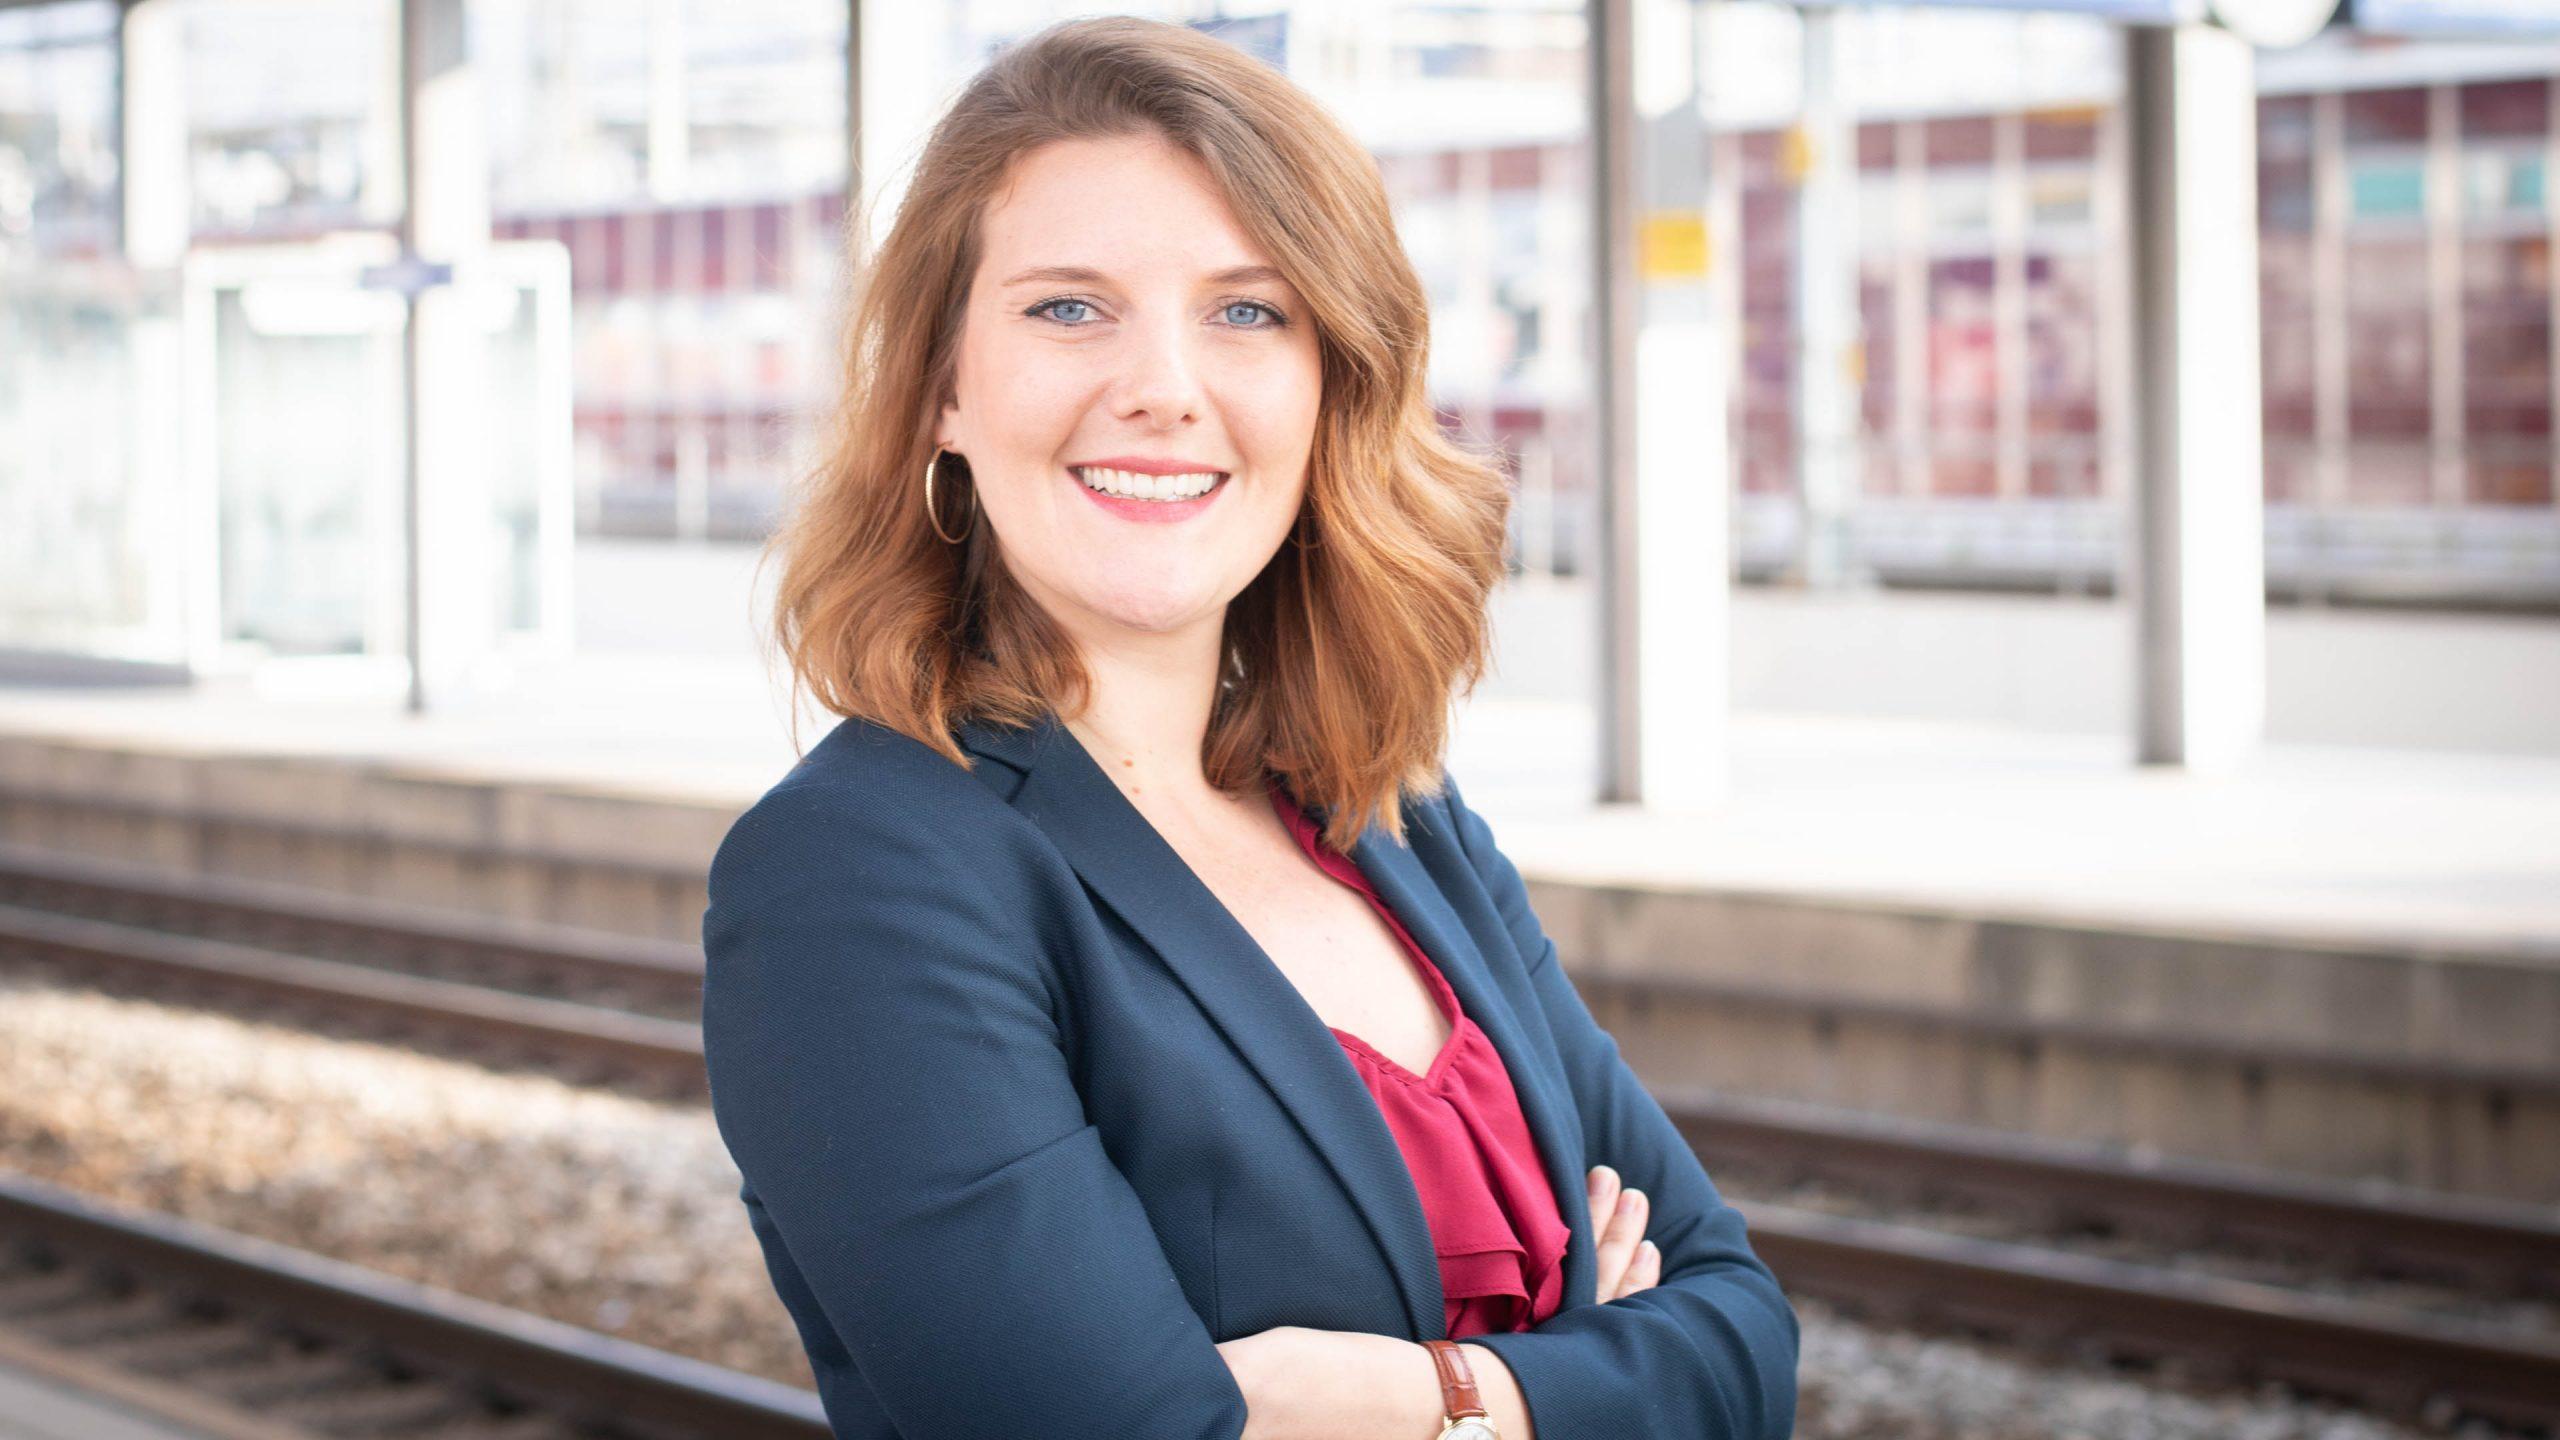 Tamara-Ritter-Newsroom-SBB-Absolventin-Bachelor-Kommunikation-Zhaw